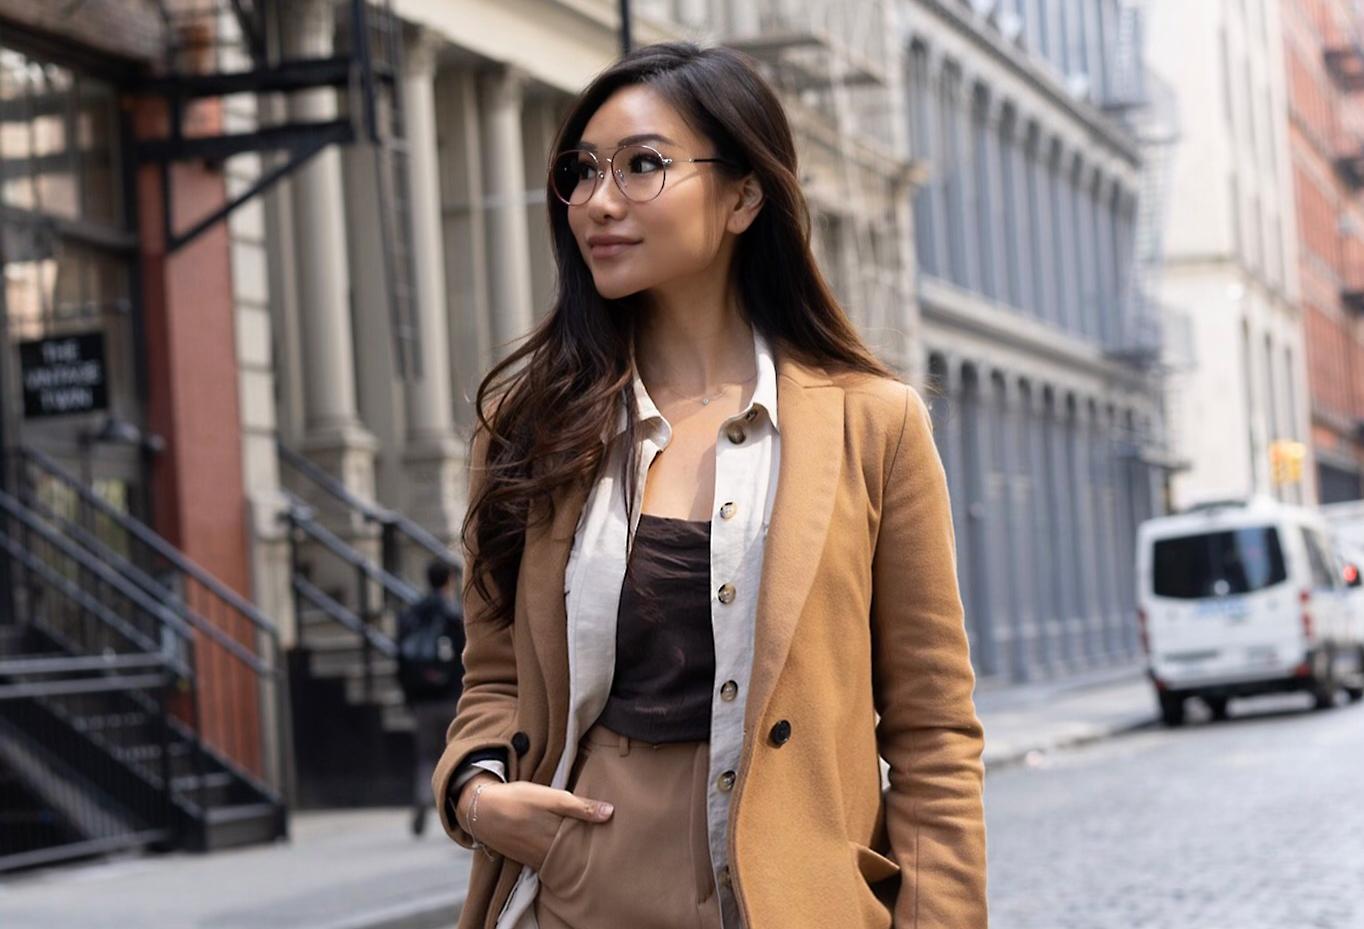 TC Charton – Asian Fit model Tobey